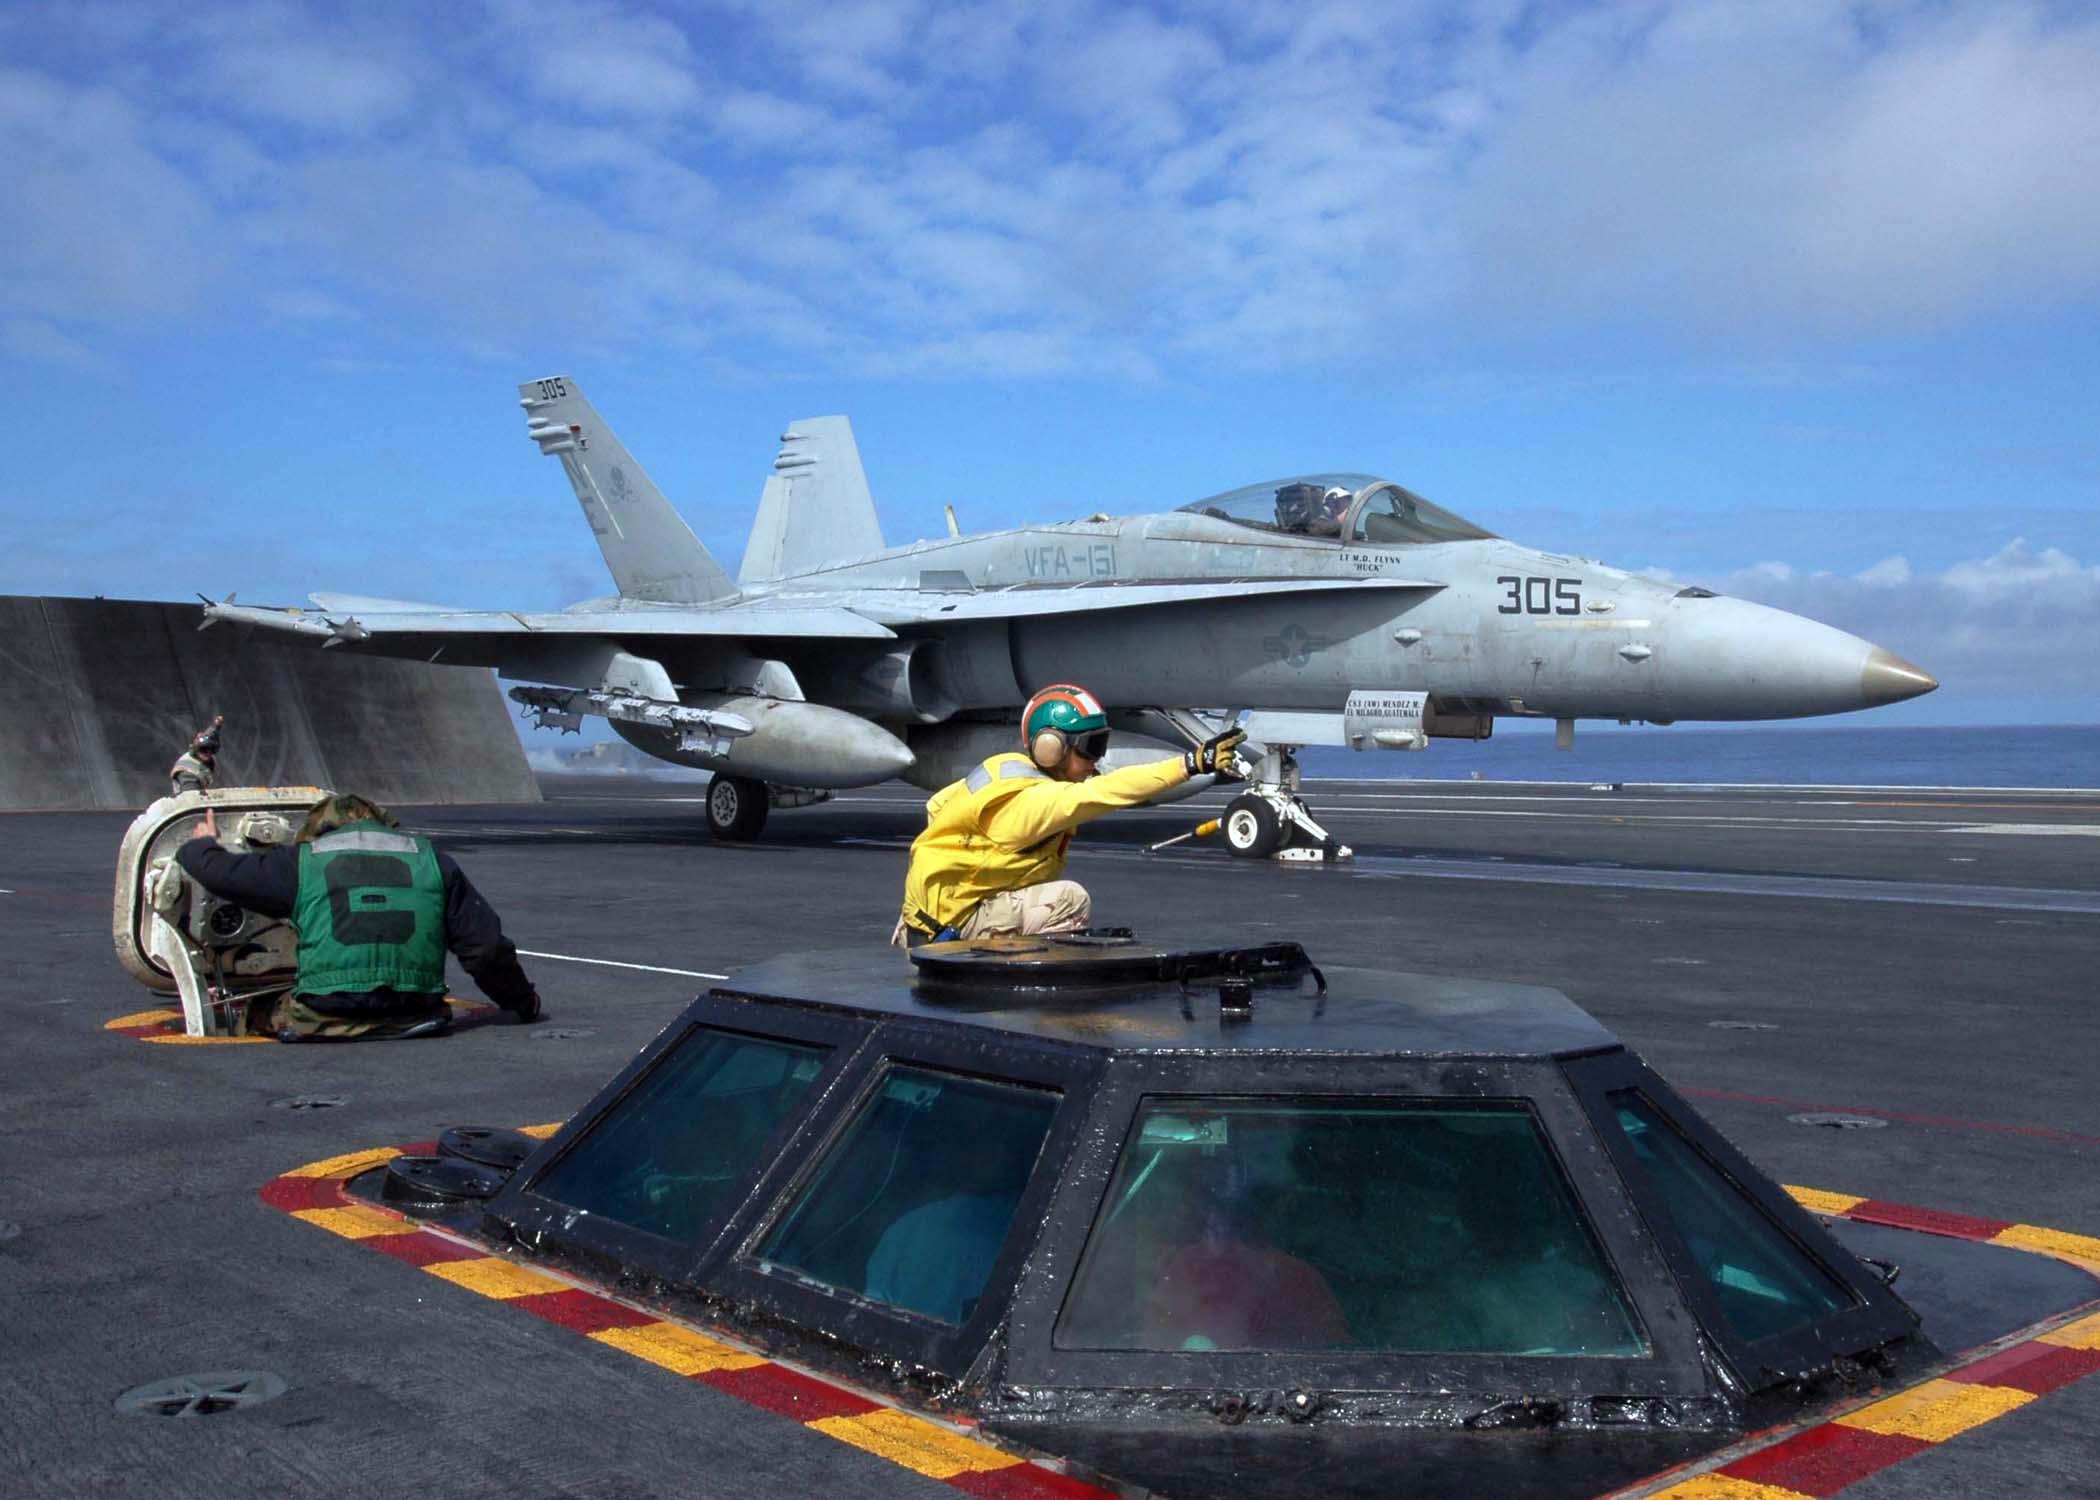 US_Navy_050228-N-1229B-052_A_catapult_shooter_signals_for_the_launch_of_an_F-A-18C_Hornet_on_the_flight_deck_aboard_the_Nimitz-class_aircraft_carrier_USS_Abraham_Lincoln_%28CVN_72%29.jpg